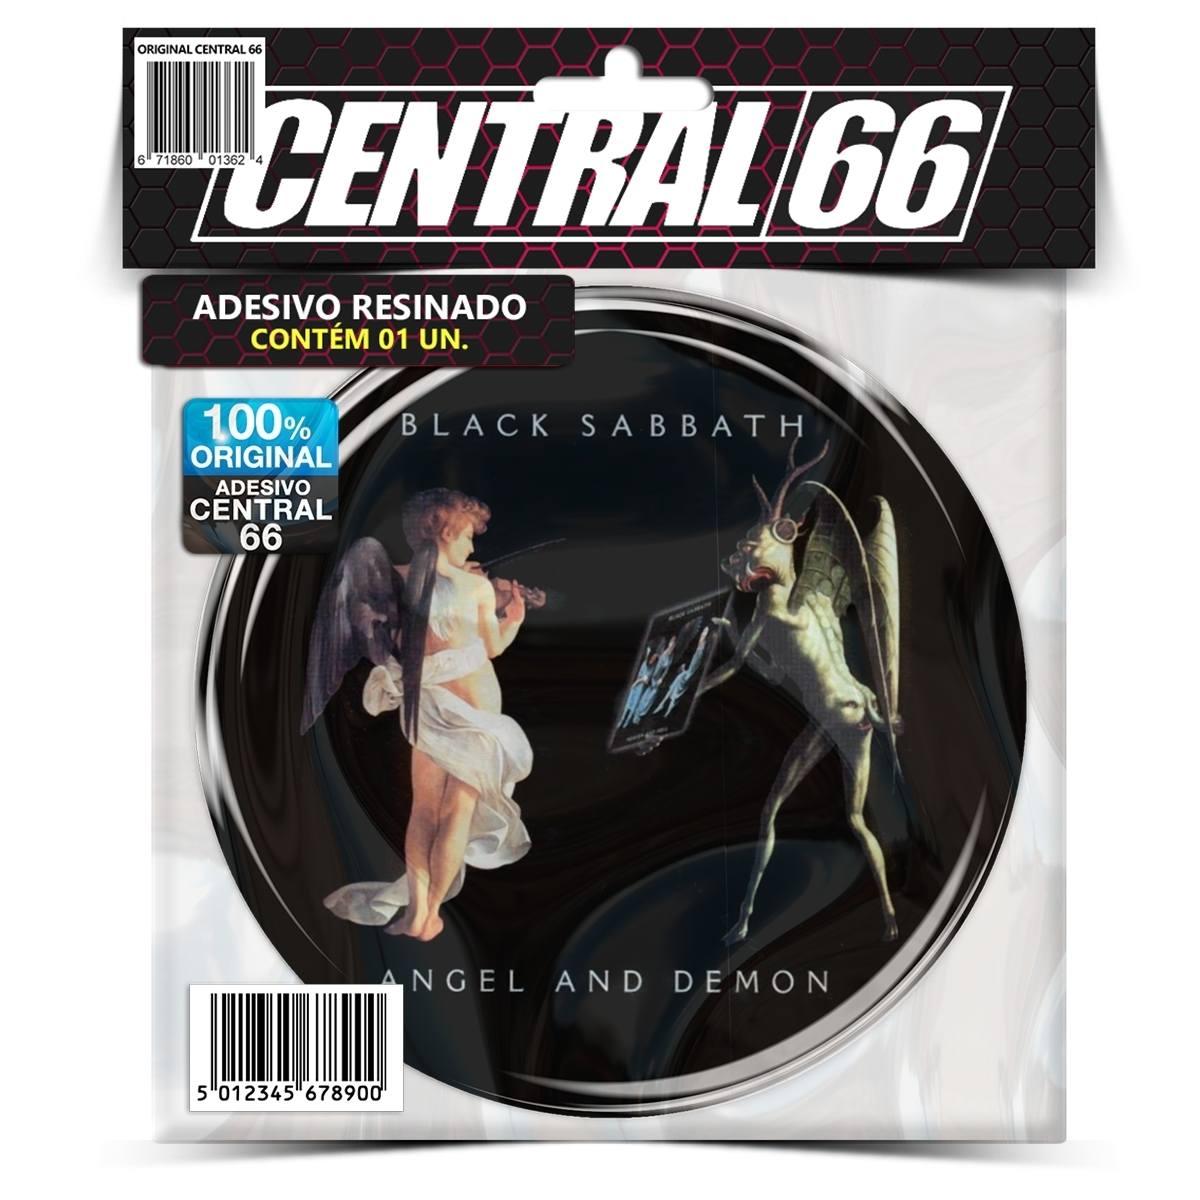 Adesivo Redondo Black Sabbath Angel and Demon – Central 66